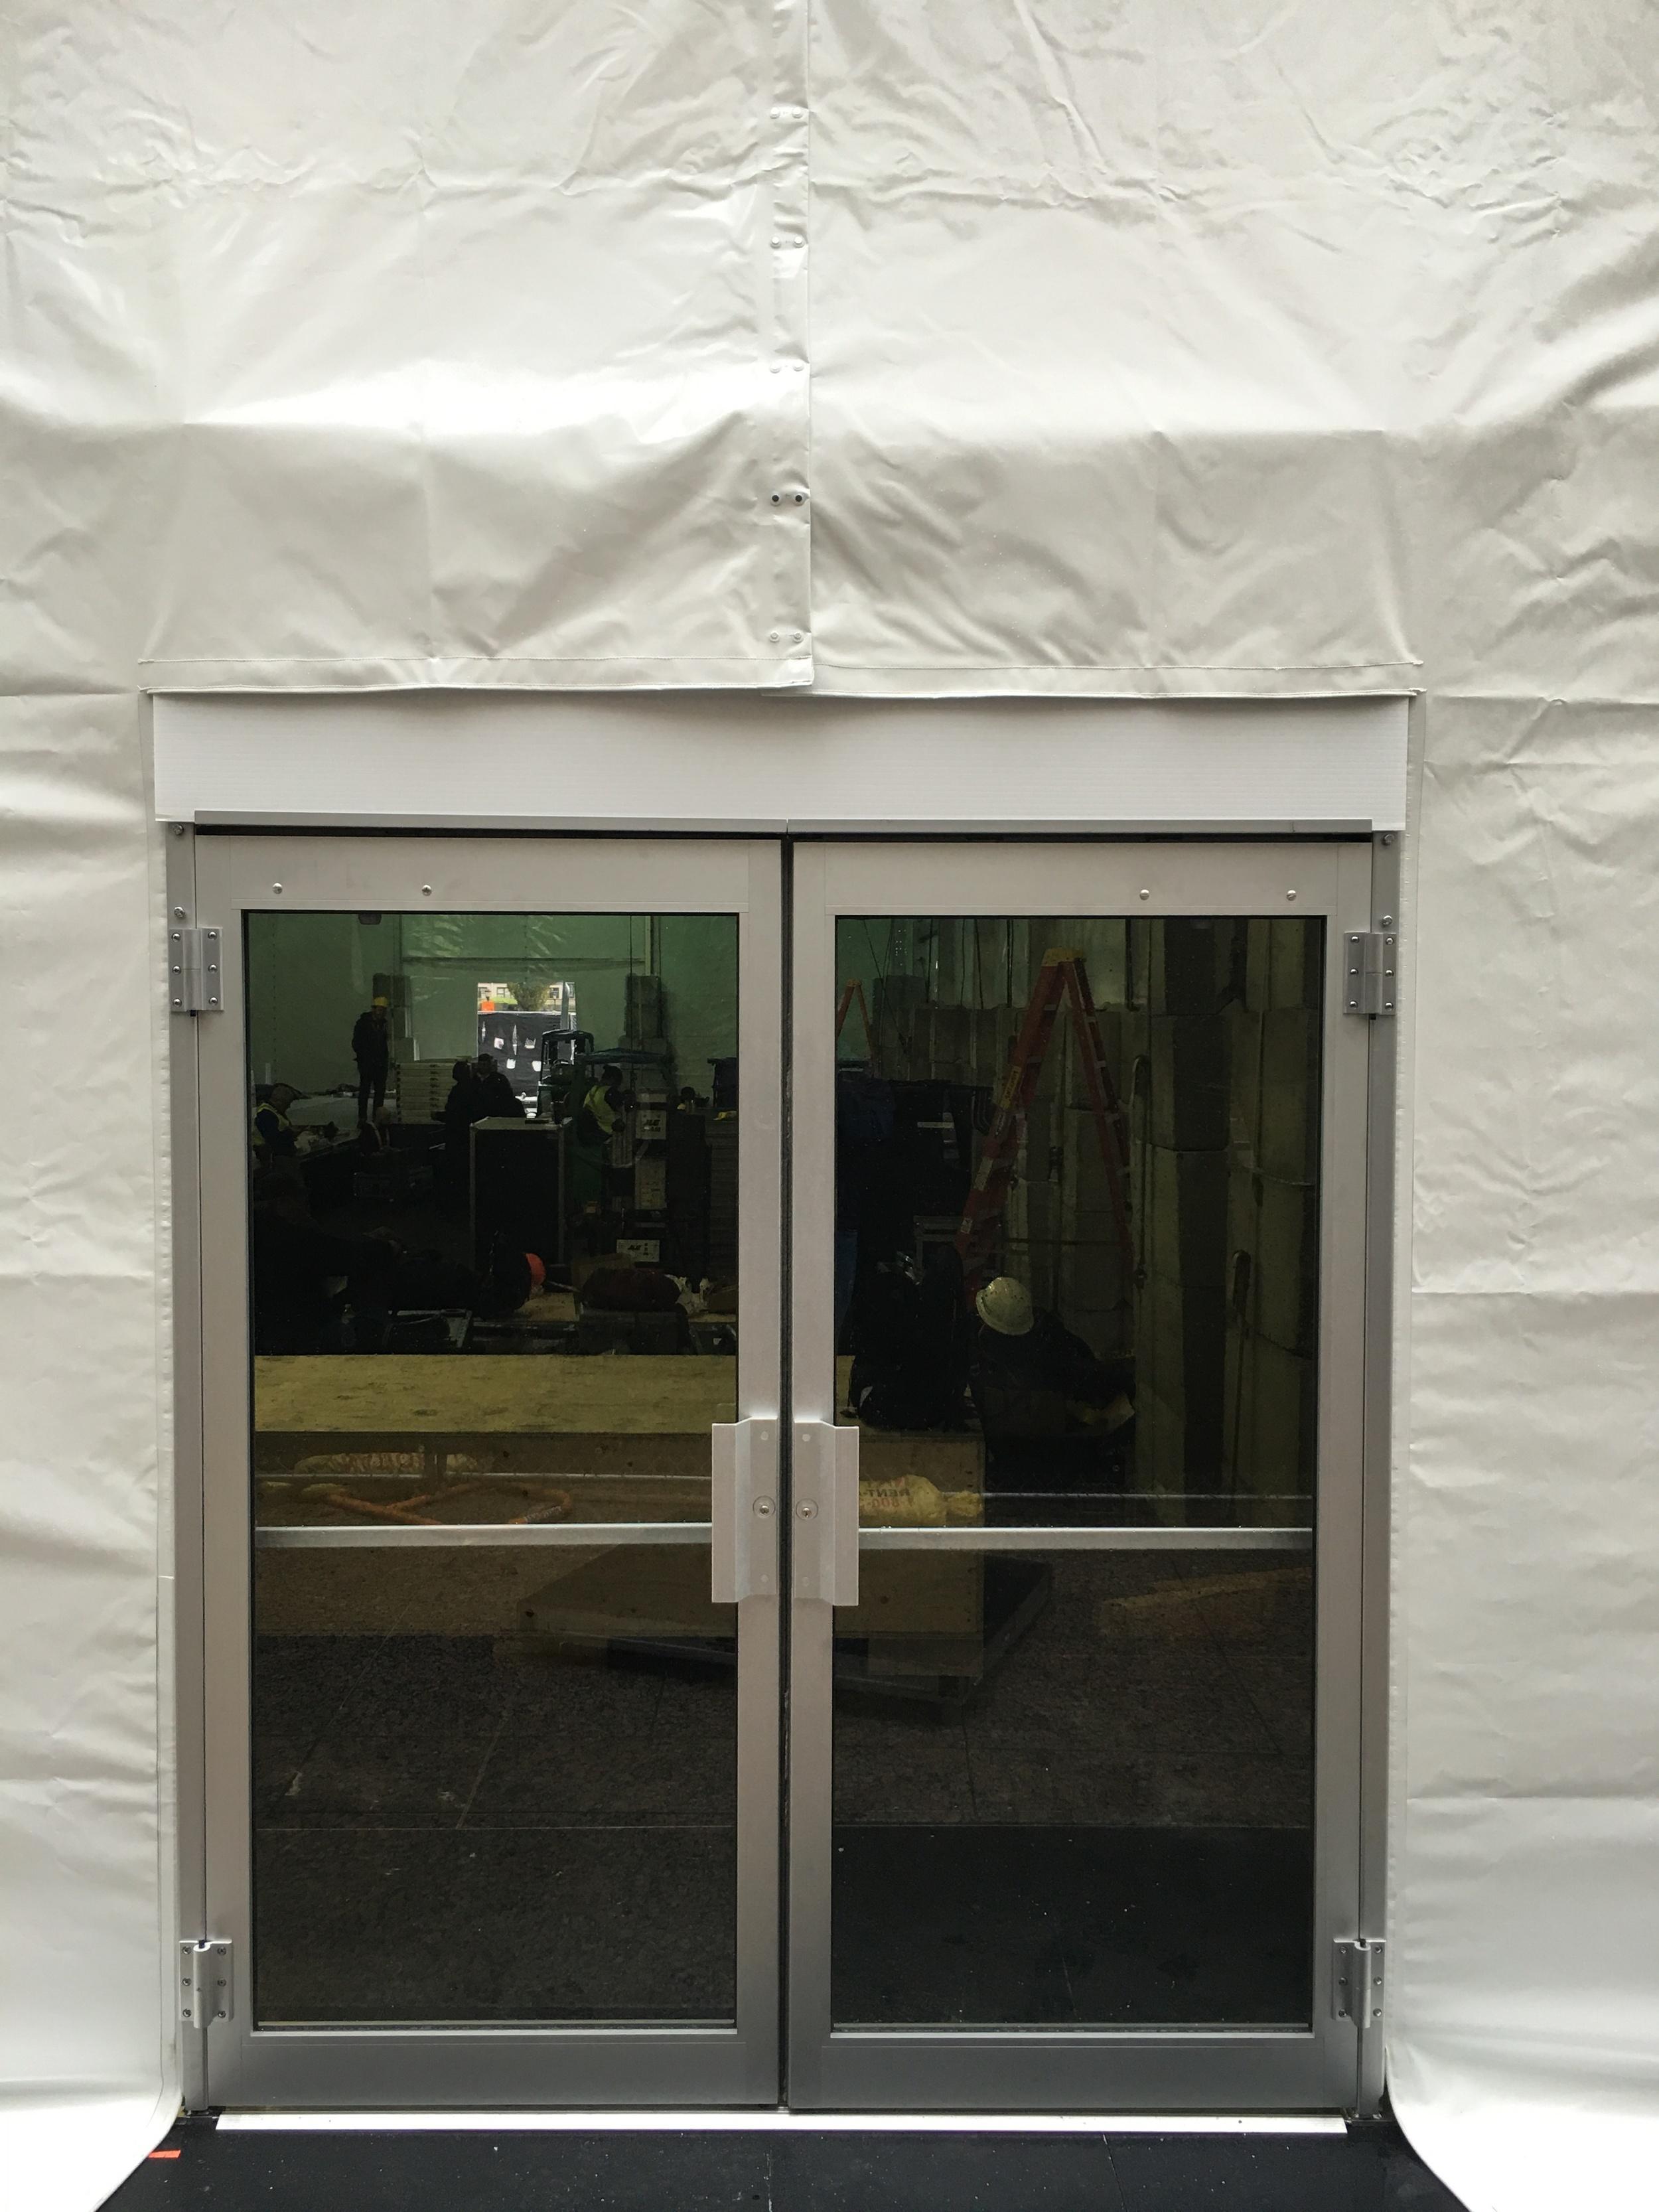 One of three tent exit doors